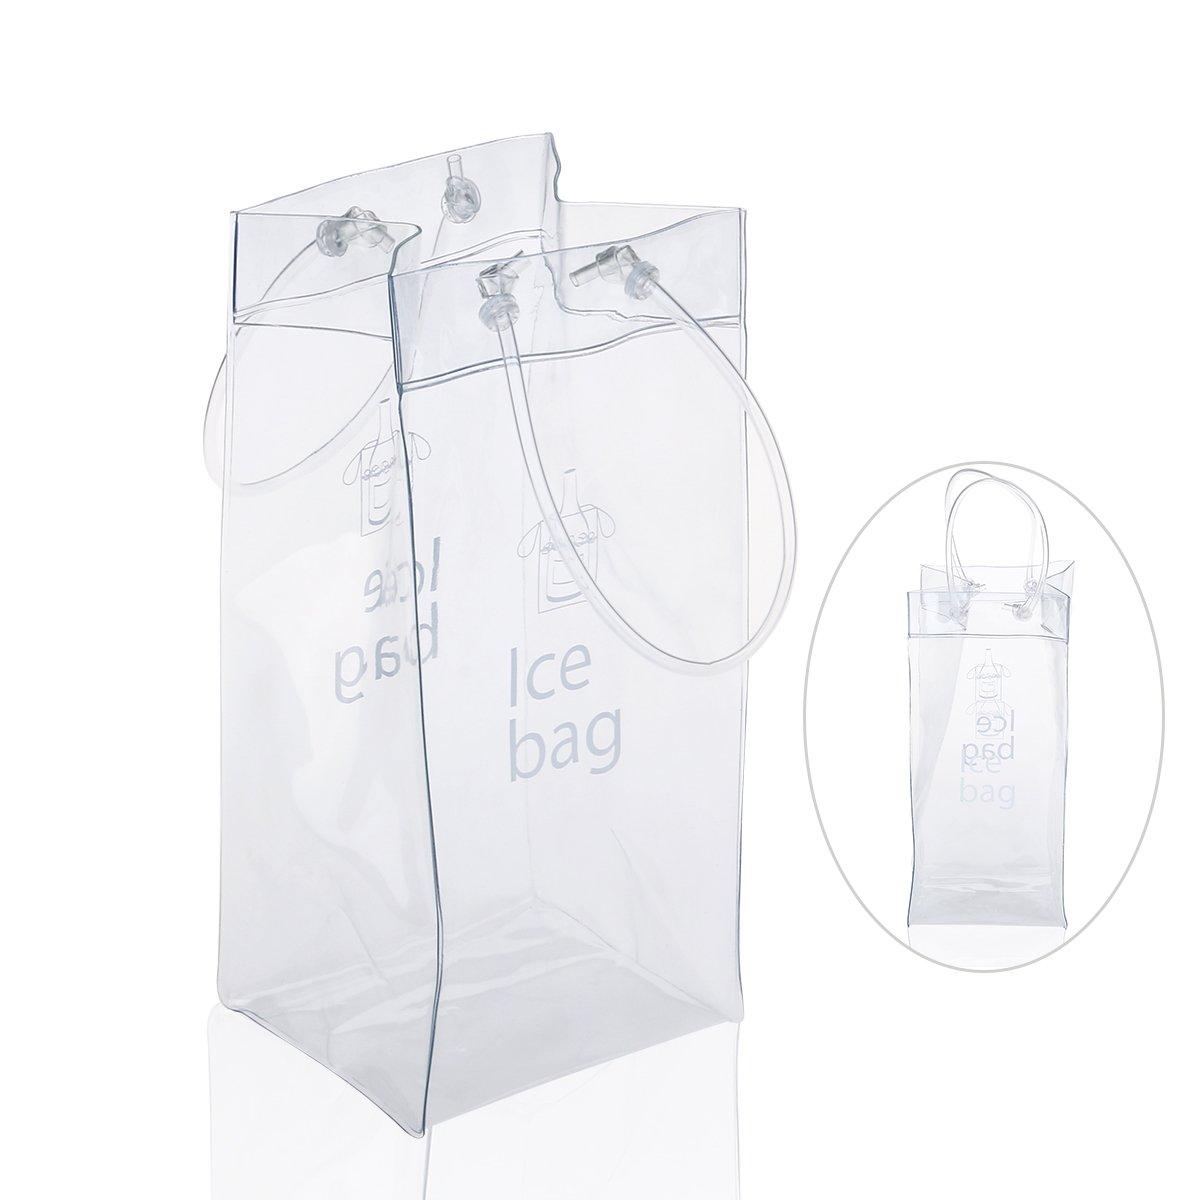 LEORX Bolso de hielo Champagne PVC bolsa vino Bolsa nevera con asa